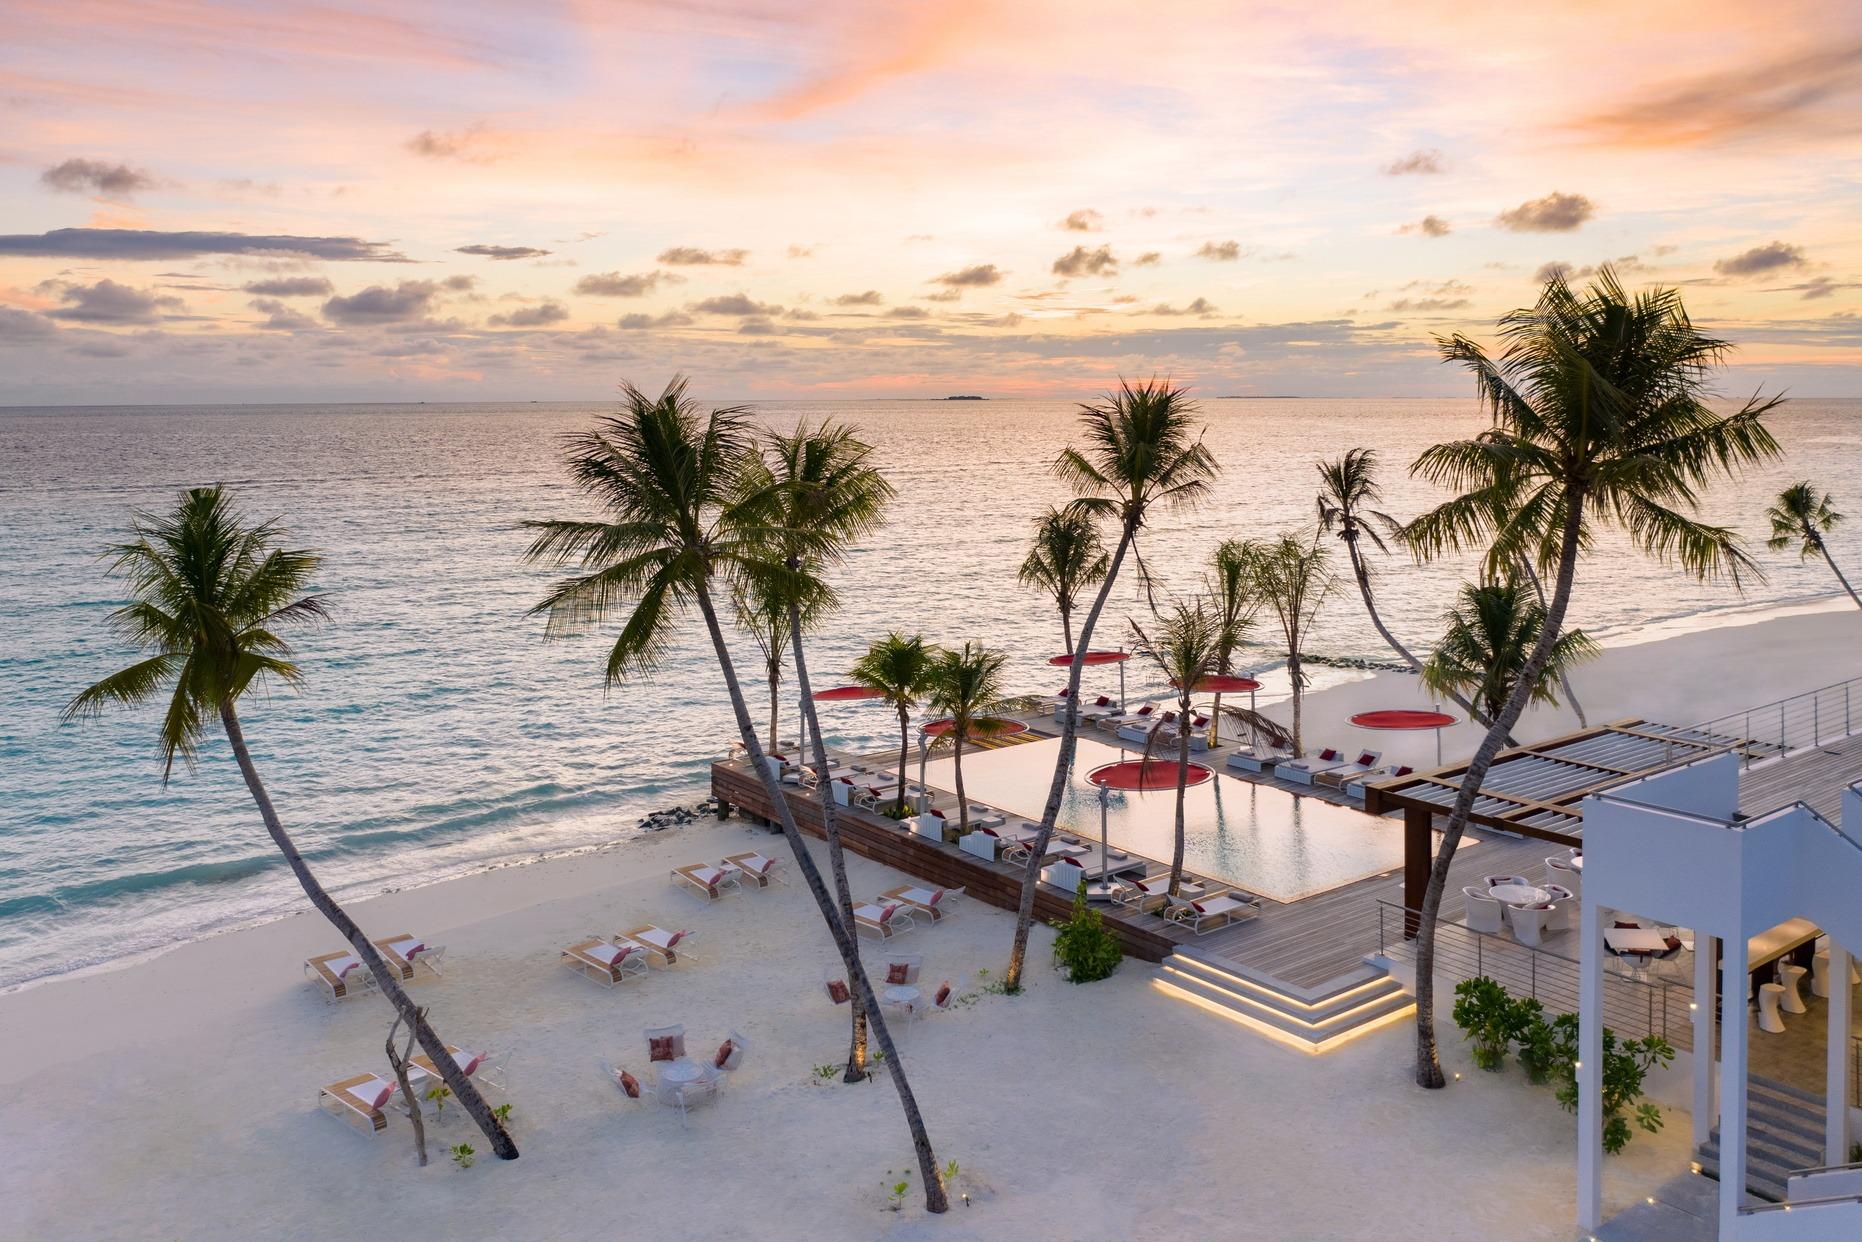 LUX NMA BeachRouge sunrise 1862x1242 1 - LUX* North Male Atoll Resort & Villas, Malediven